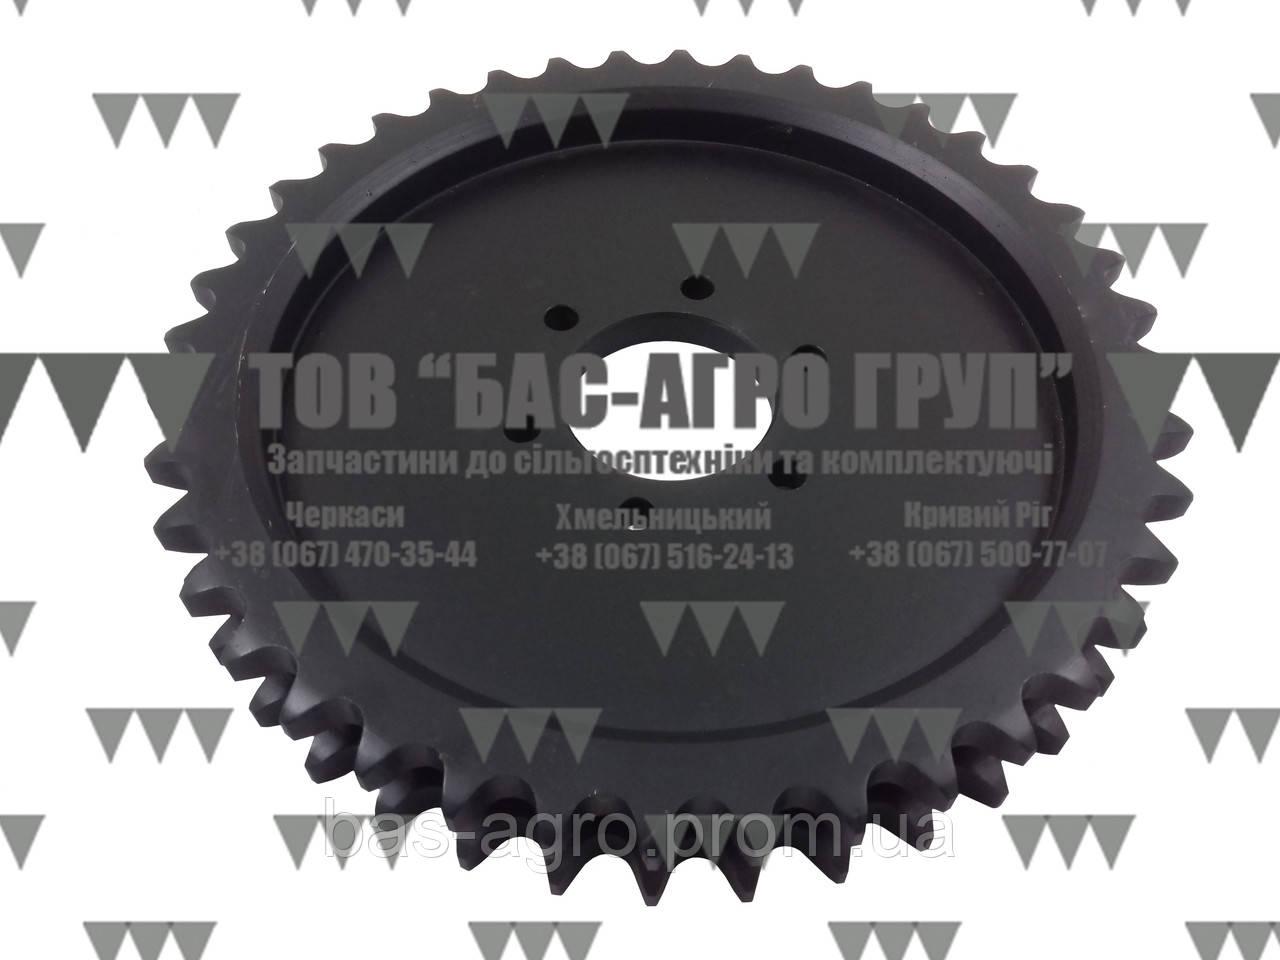 Звездочка двойная Z-40/40 Oros 1.307.404 аналог